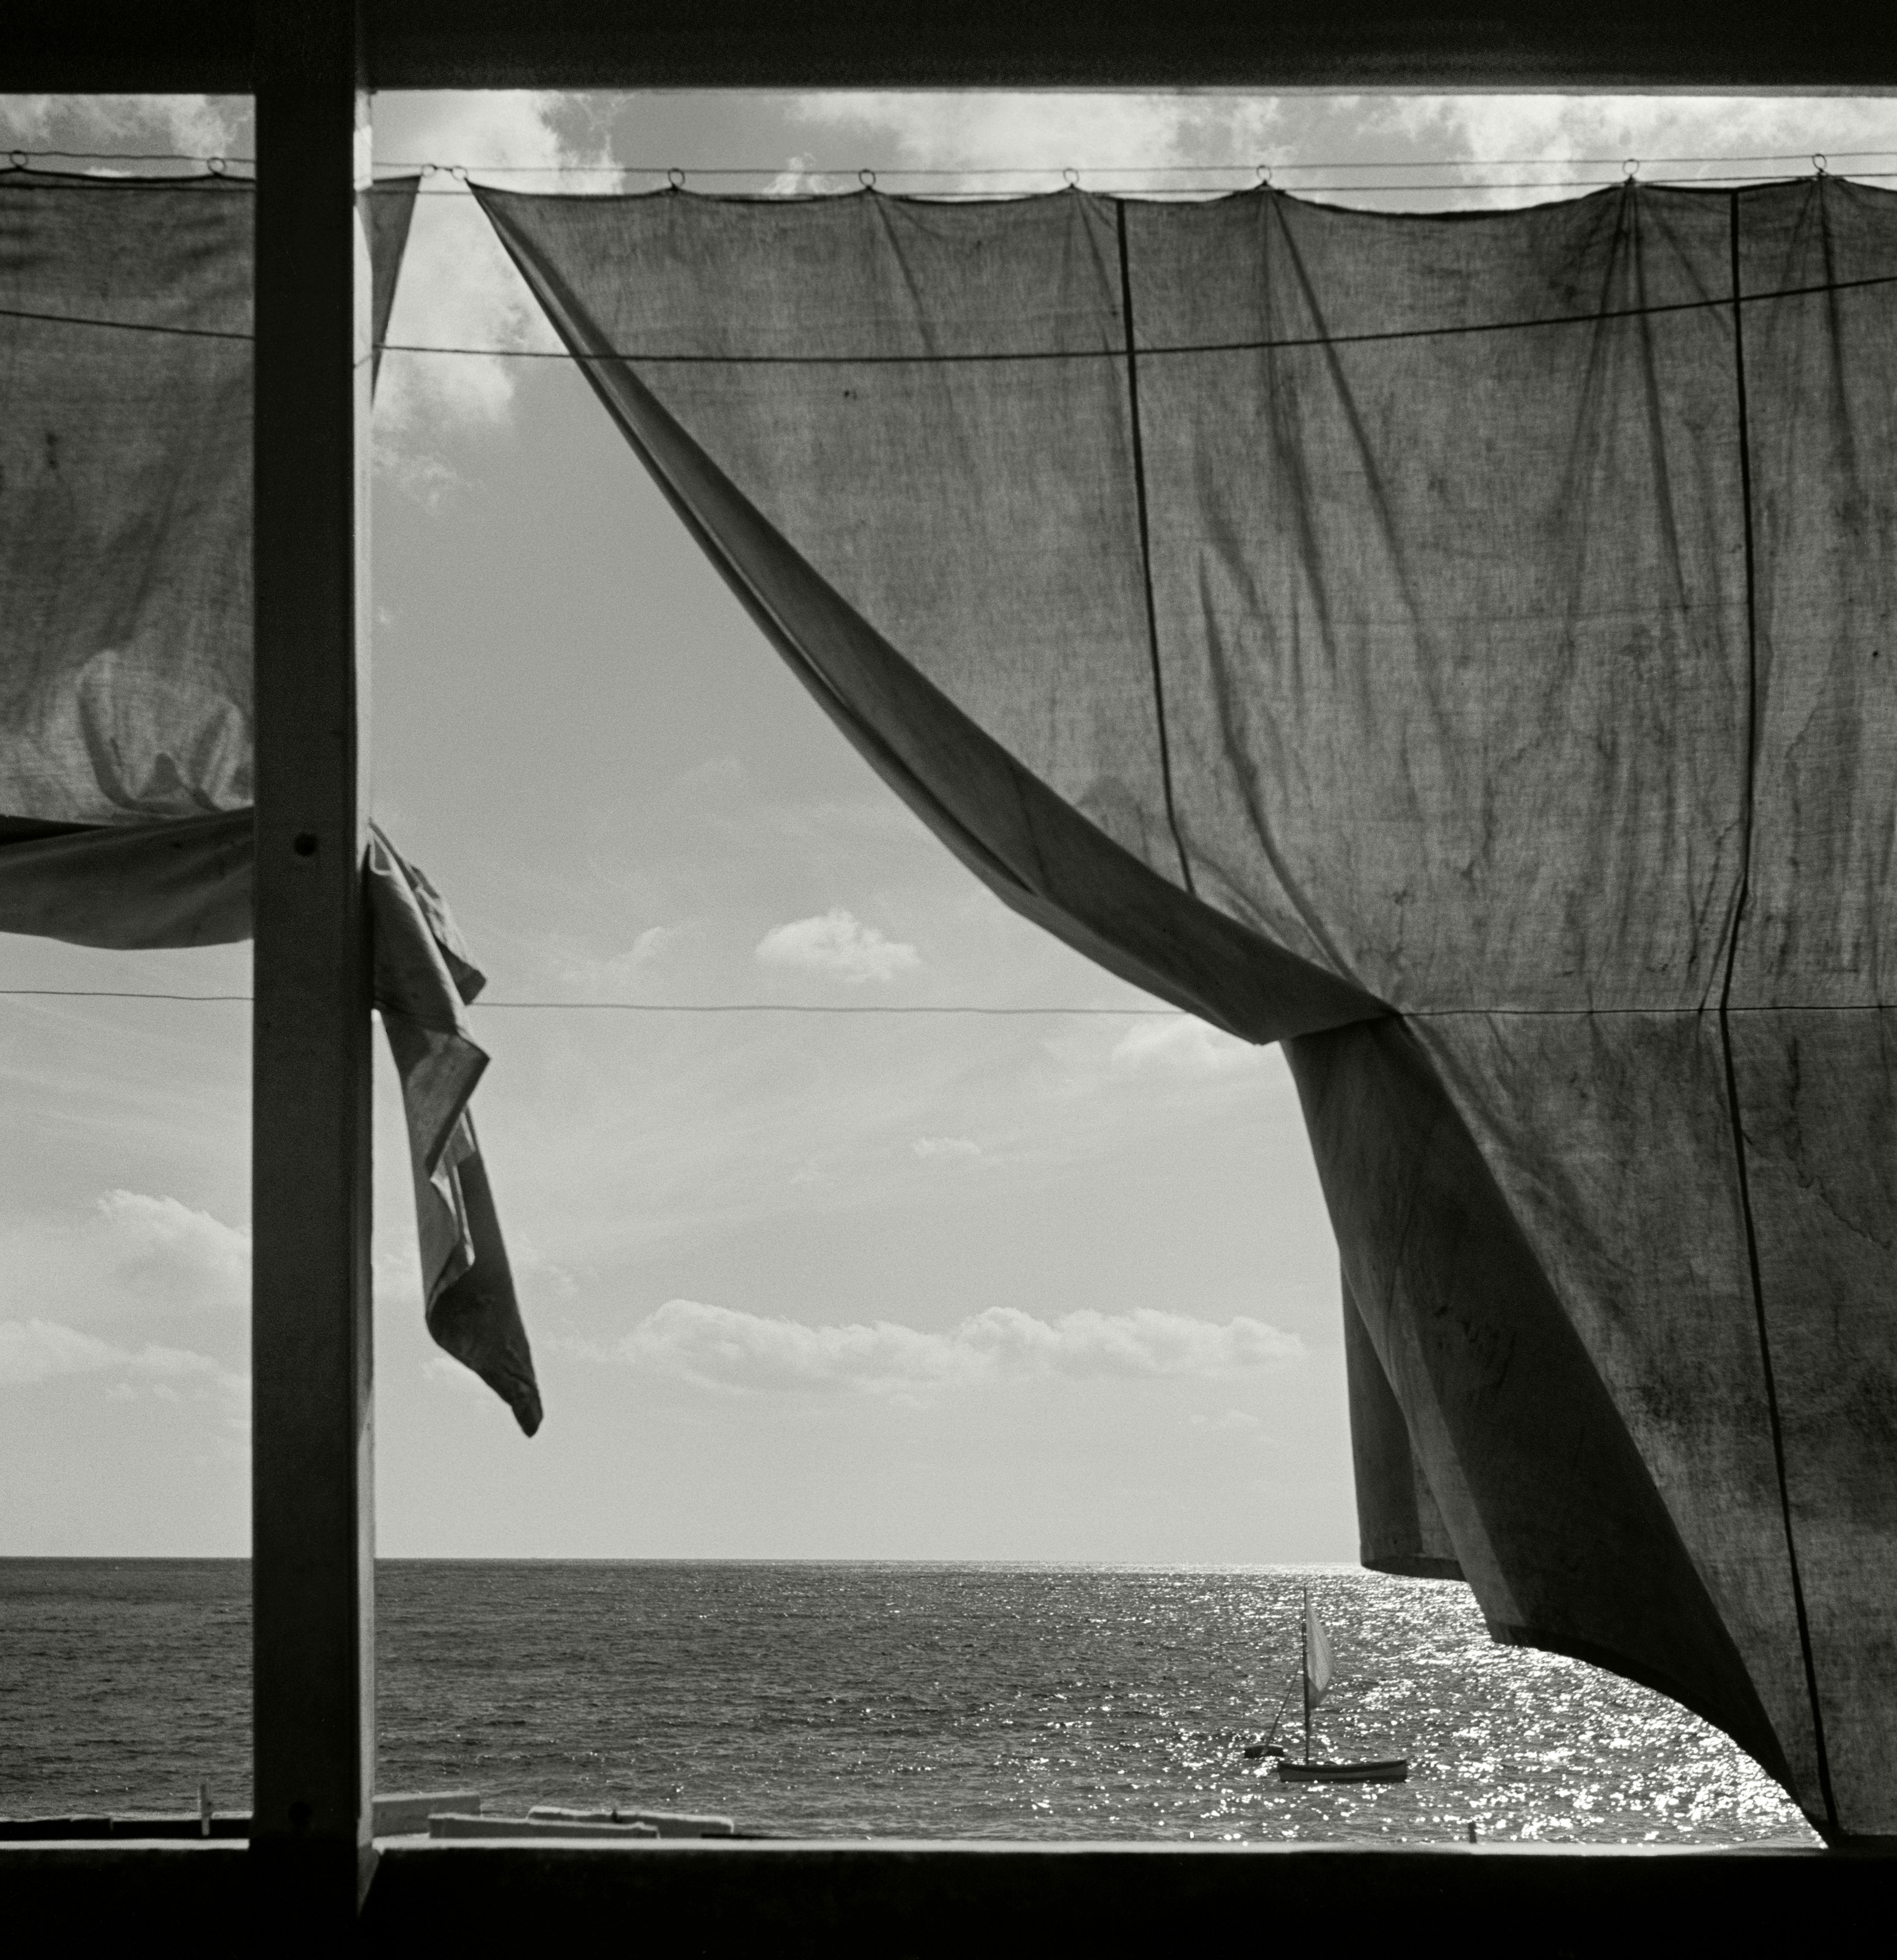 Liguria Italy 1936 window view of sea by Herbert List